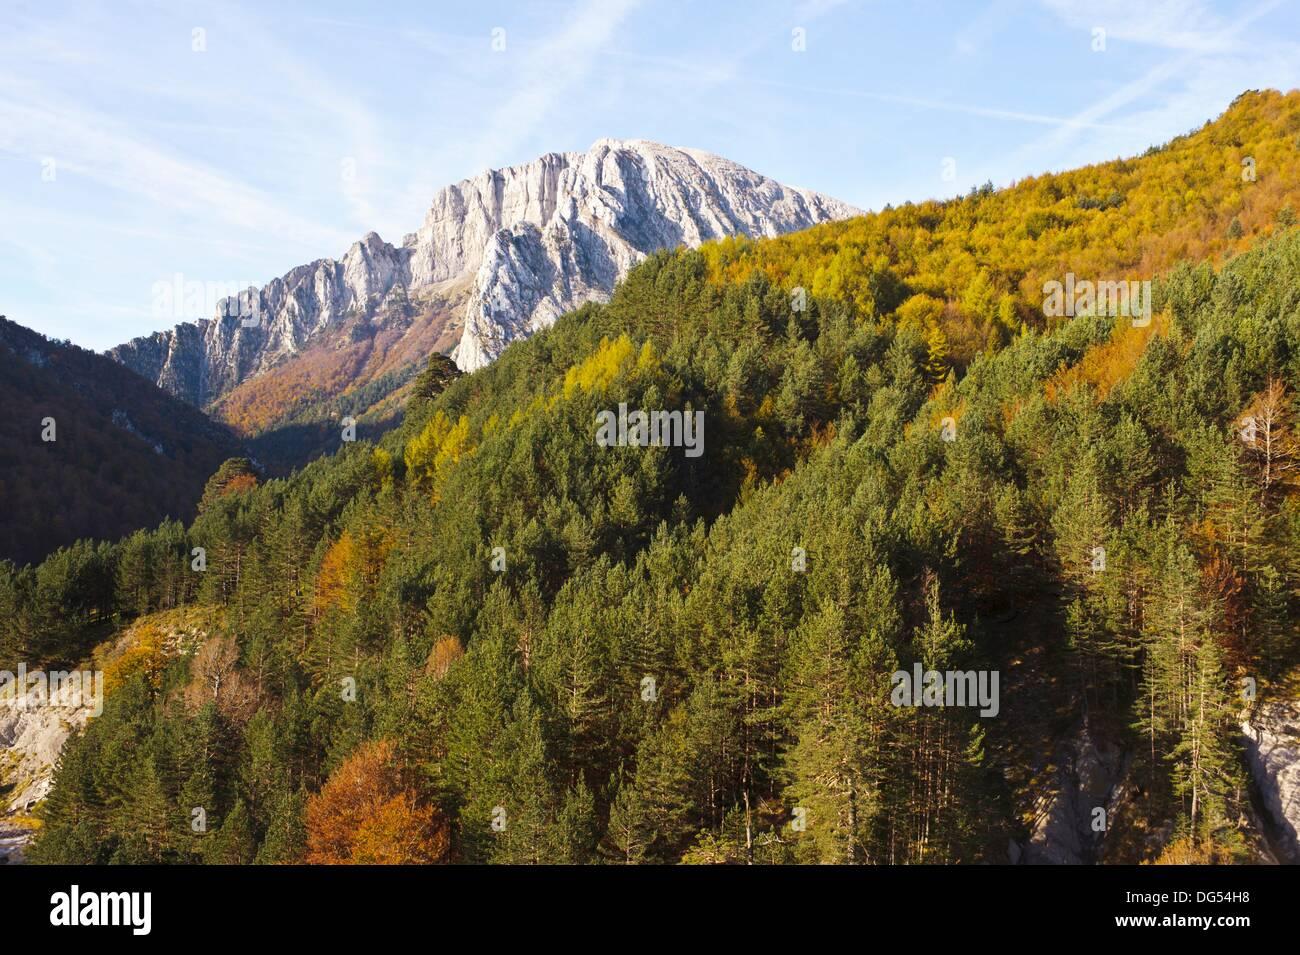 Zurita, Valle de Ansó, Parque Natural Valles Occidentales, Pyrenees, Huesca province, Aragon, Spain. - Stock Image